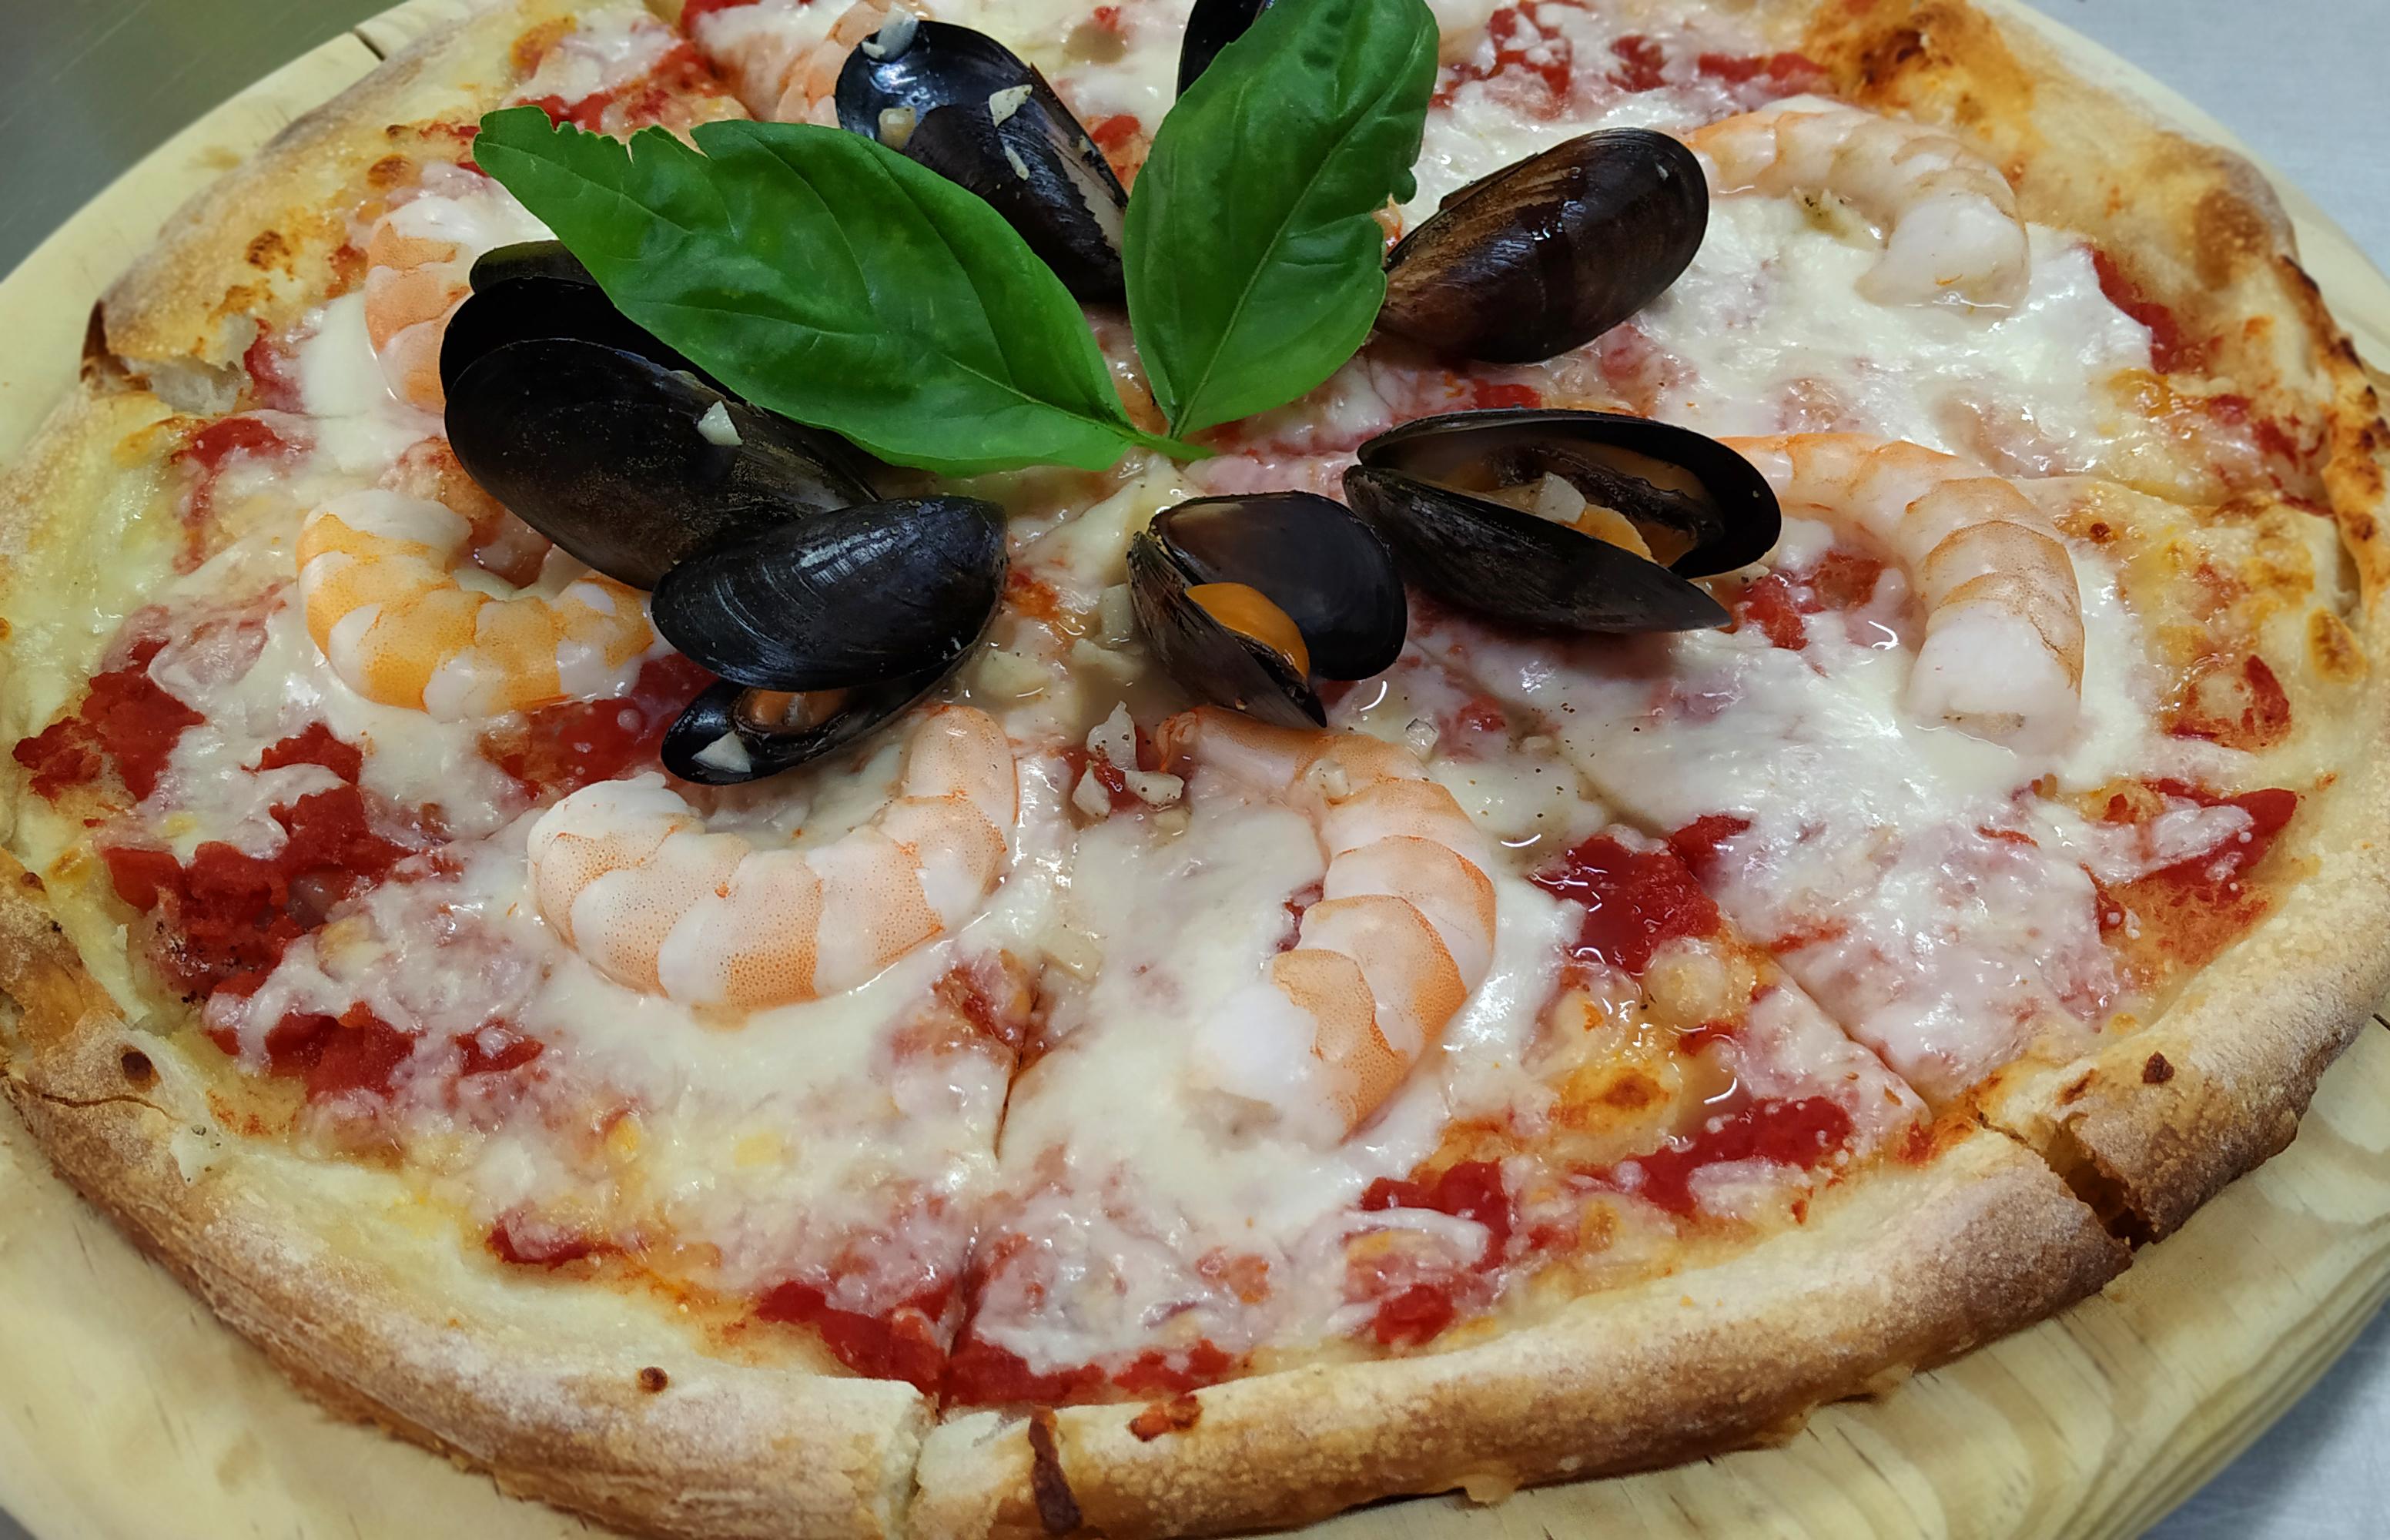 Pizza artesanal Altamente digerible